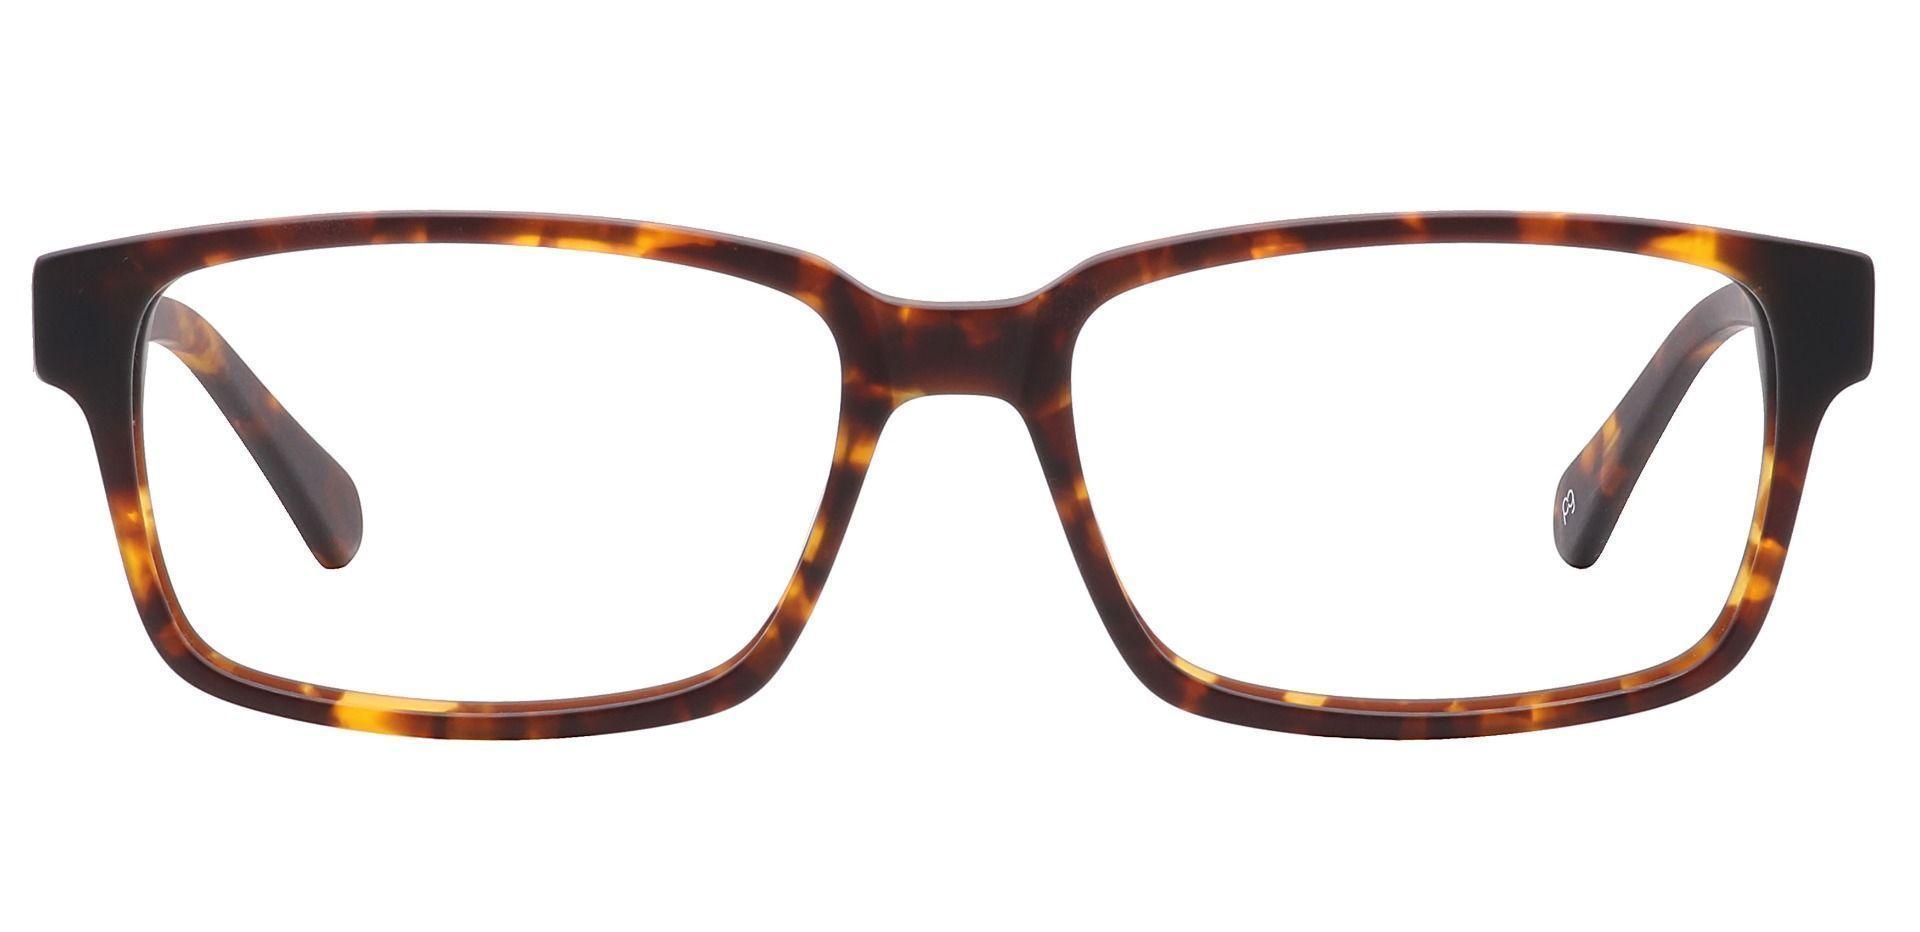 Clifford Rectangle Prescription Glasses - Tortoise